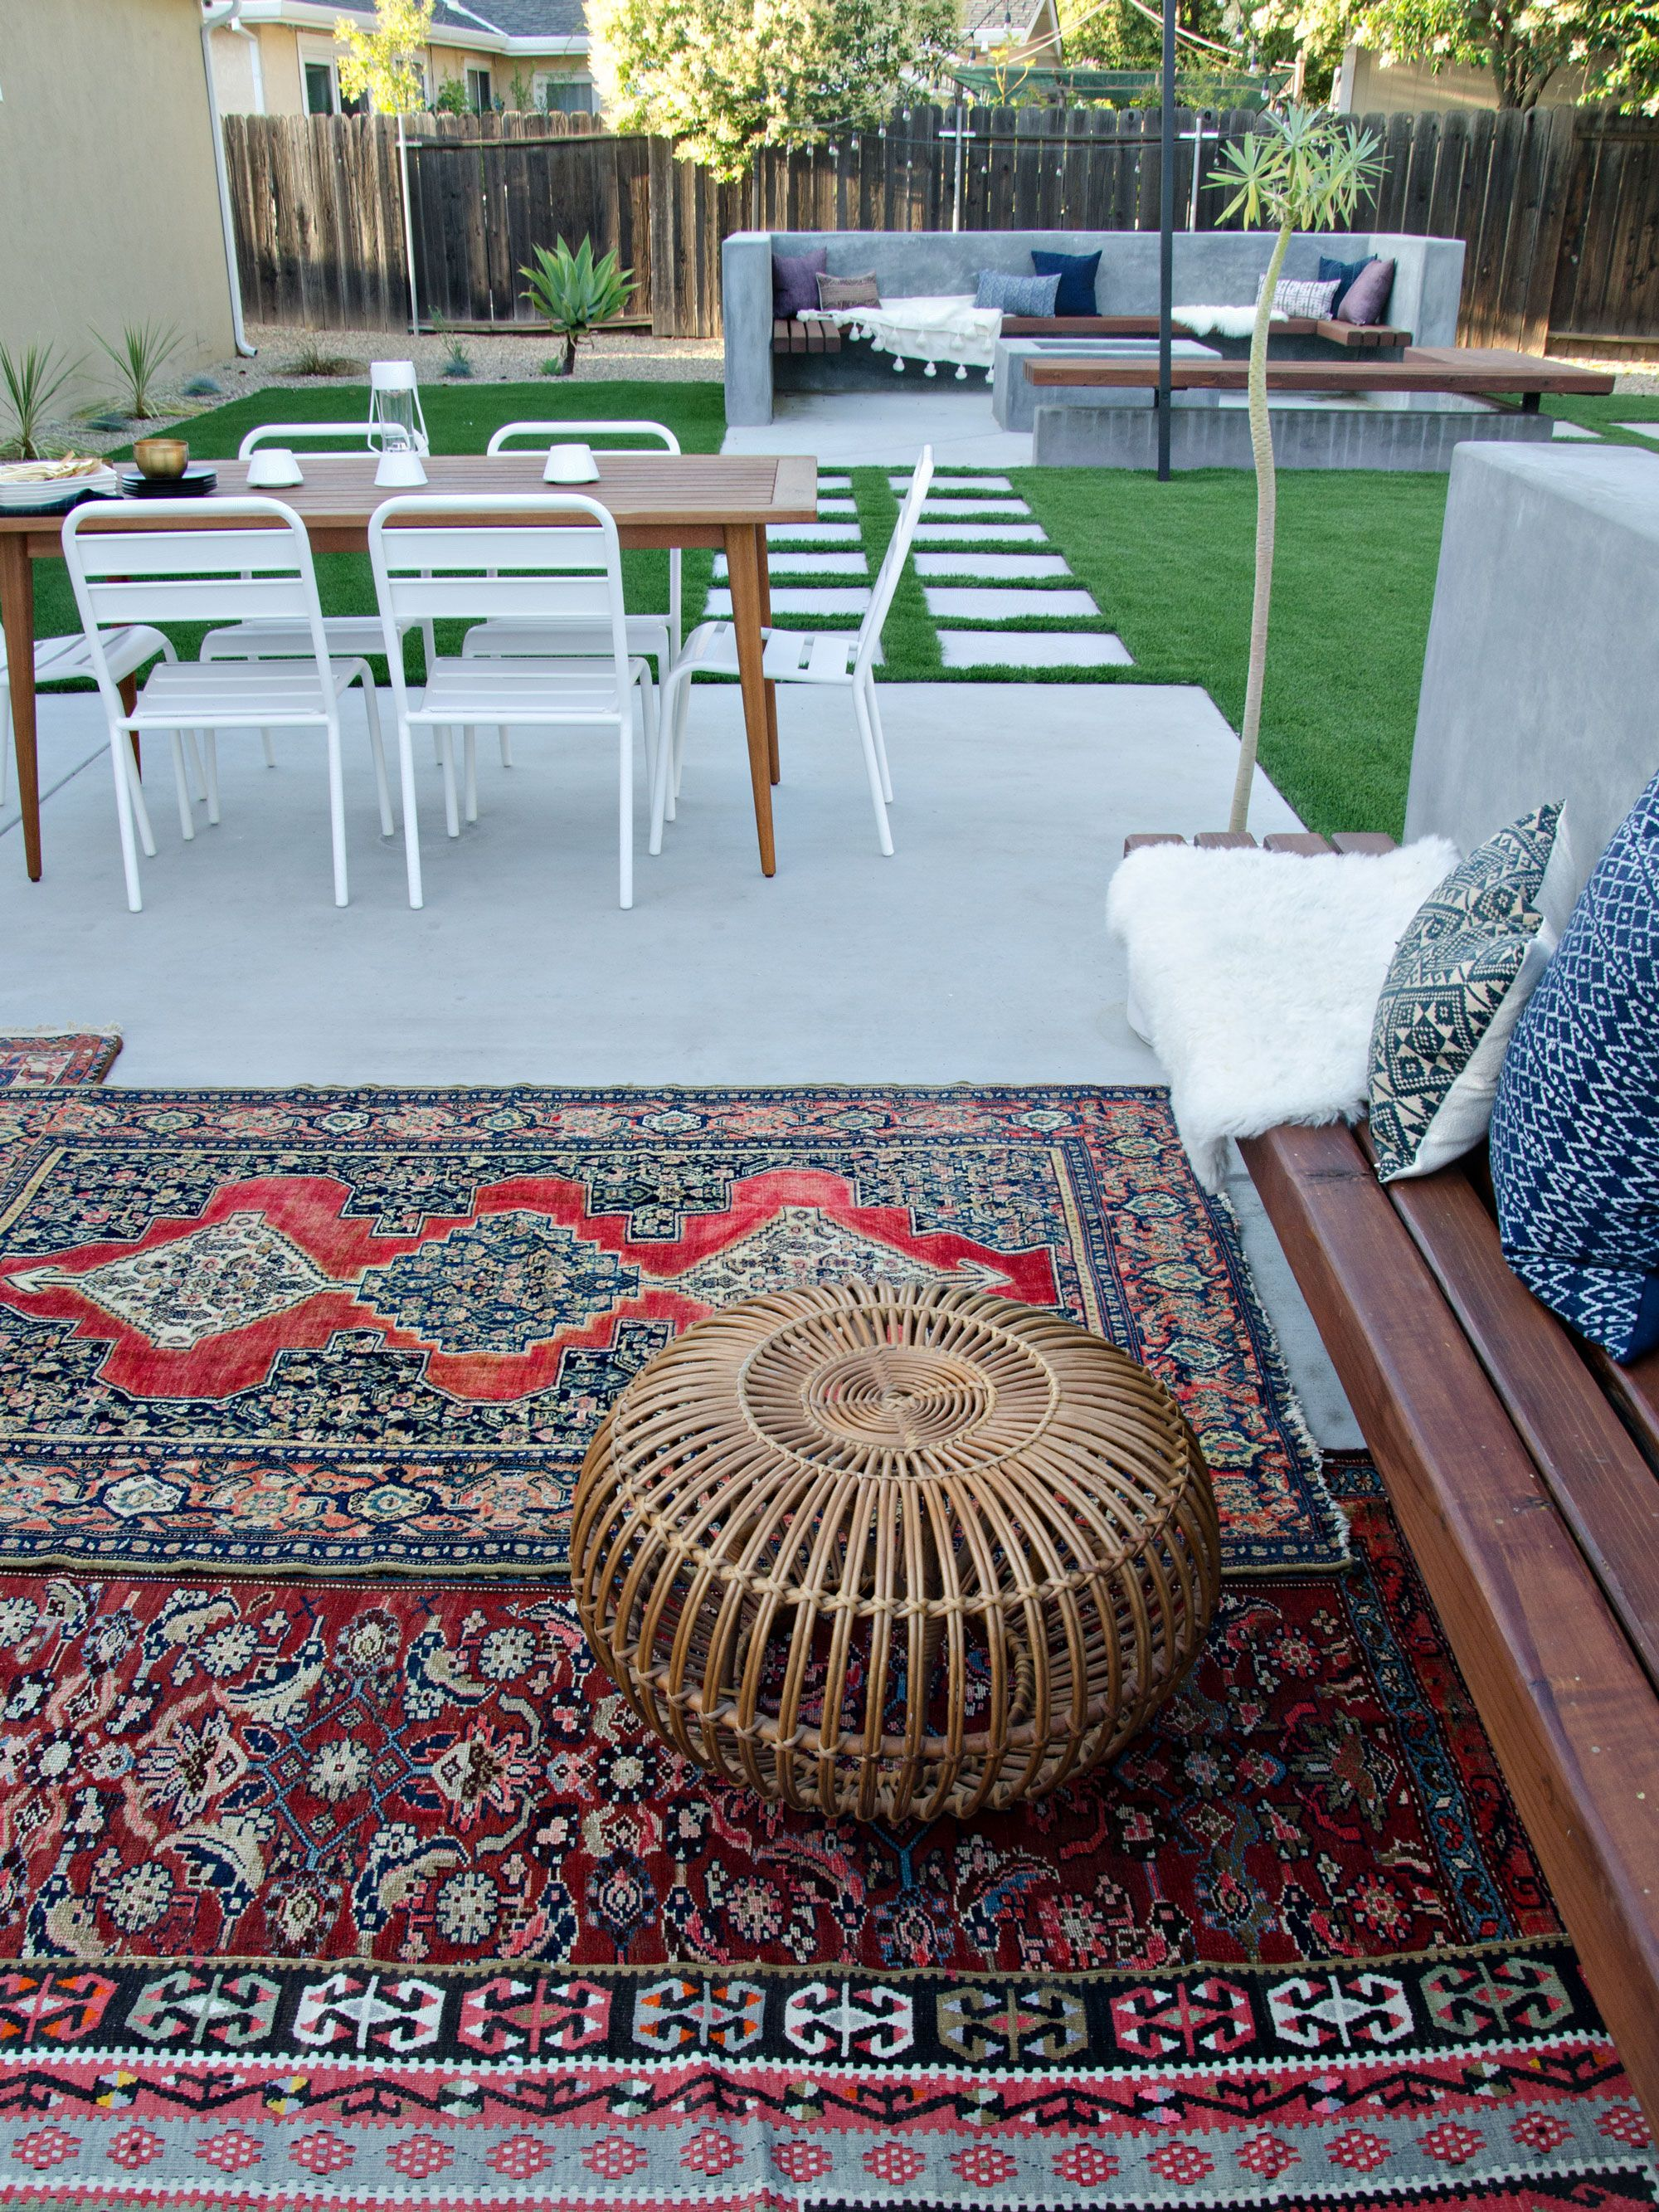 Modern California Backyard Patio Reveal | brittanyMakes ...